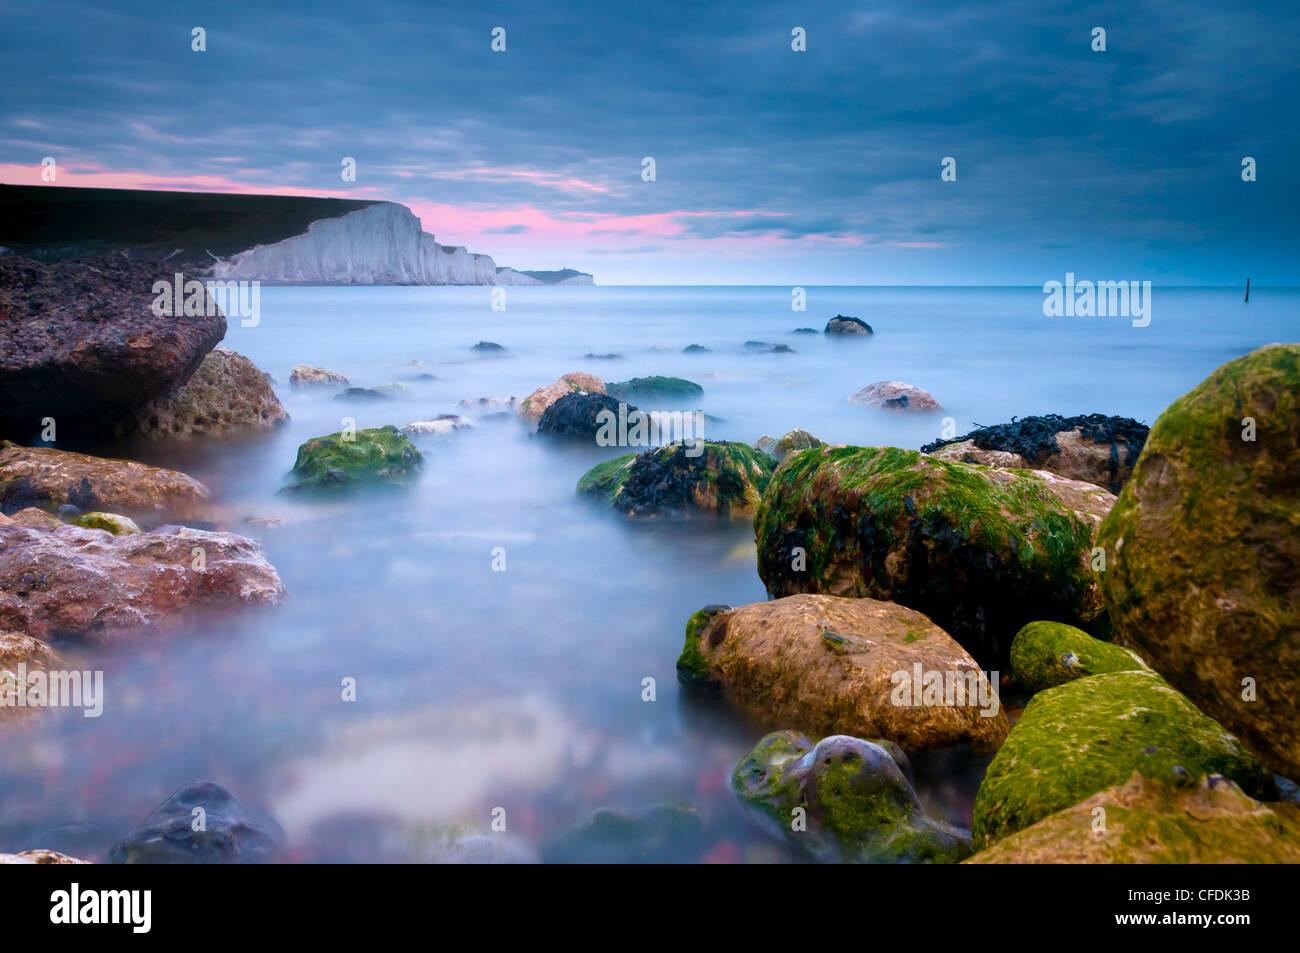 Sept Sœurs de falaises Cuckmere Haven Beach, South Downs, East Sussex, Angleterre, Royaume-Uni, Europe Photo Stock